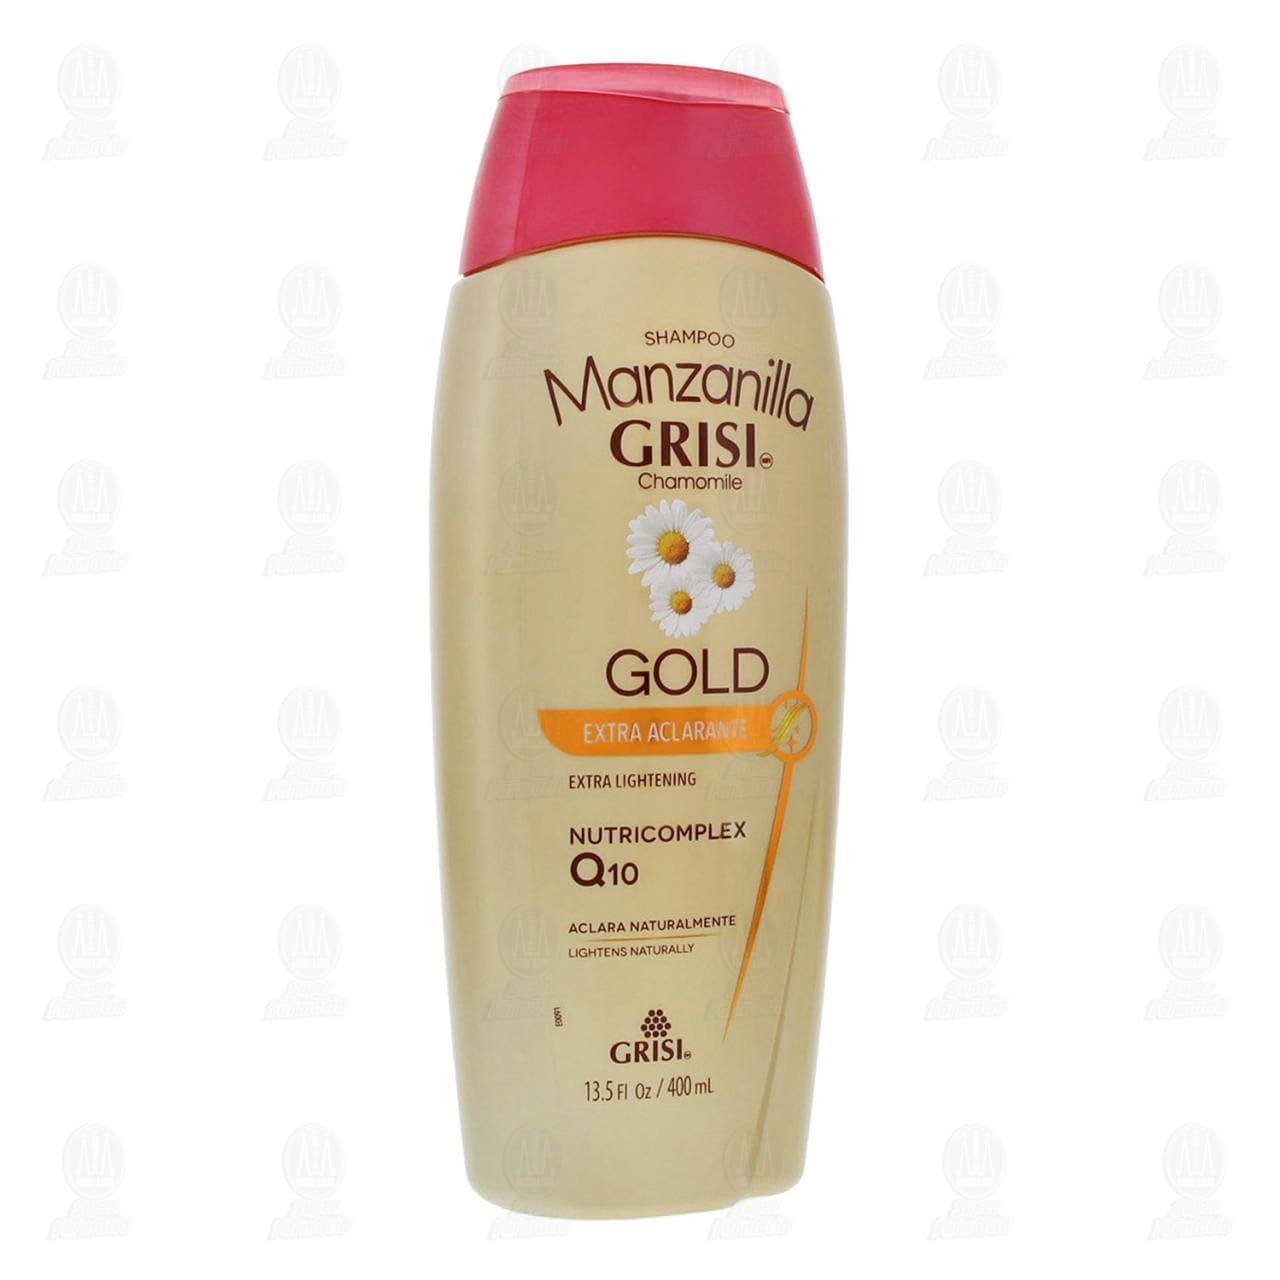 Comprar Shampoo Manzanilla Grisi Gold Extra Aclarante, 400 ml. en Farmacias Guadalajara